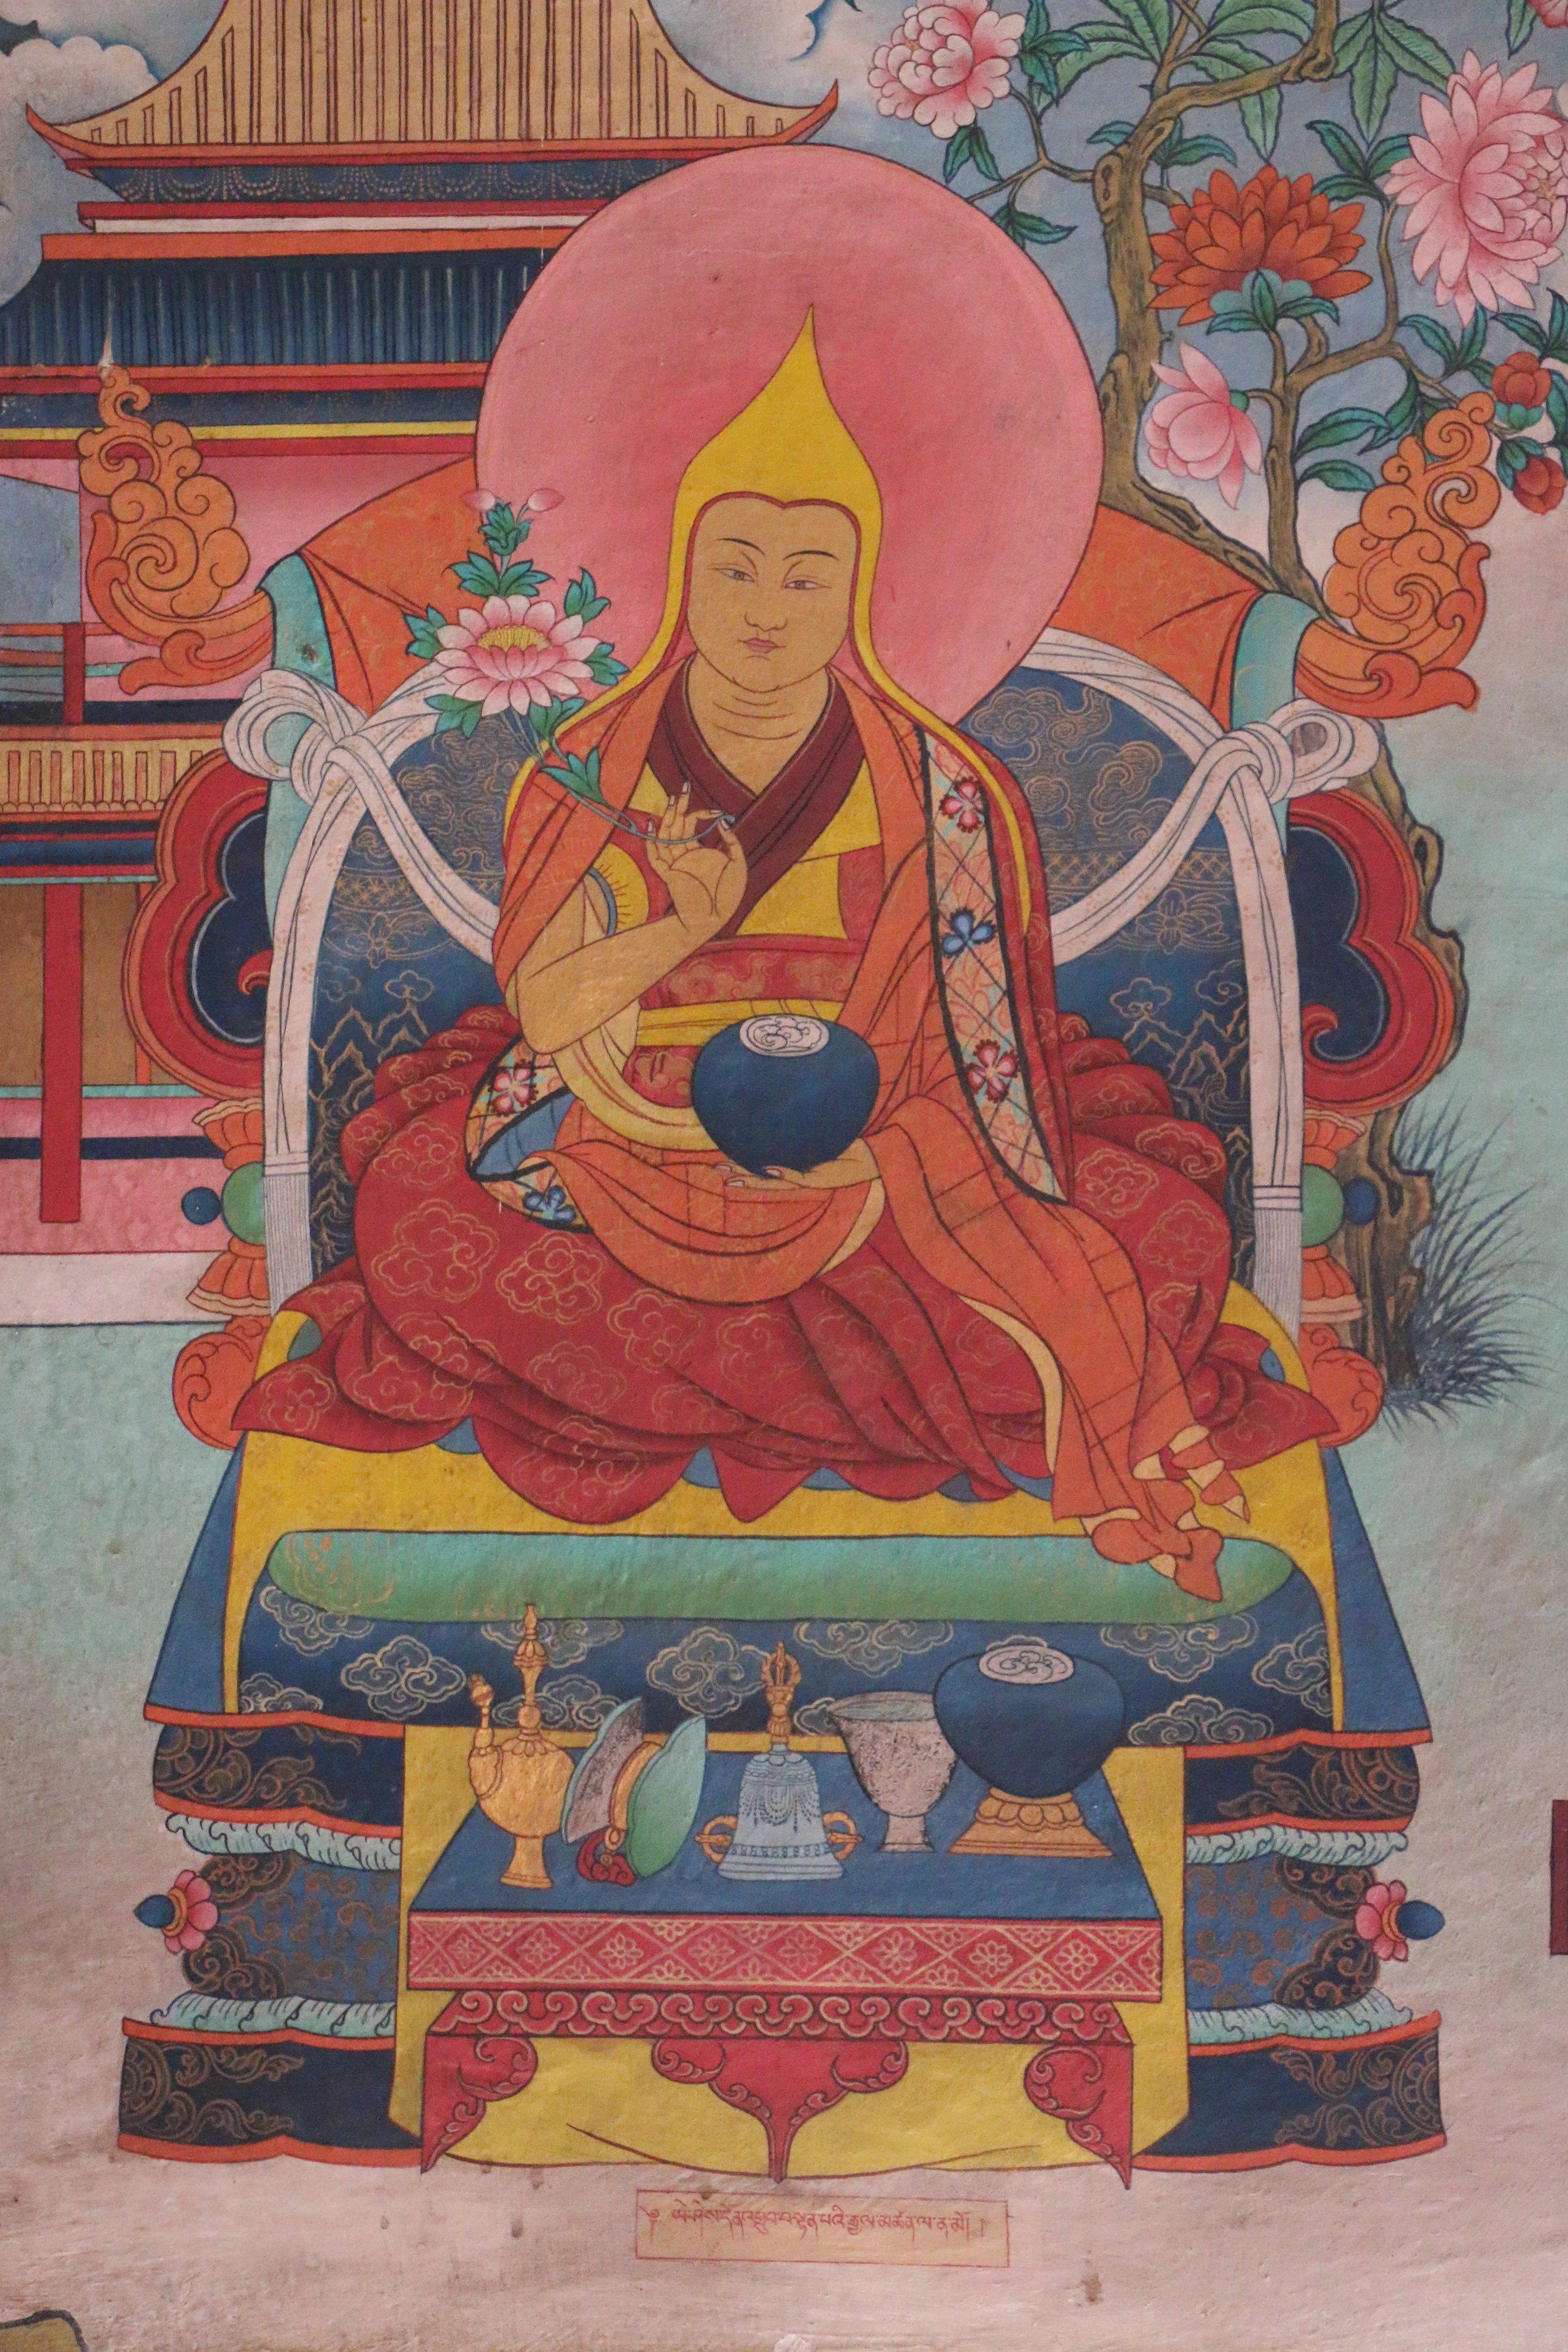 Yeshe Dondrup Tenpe Gyaltsen